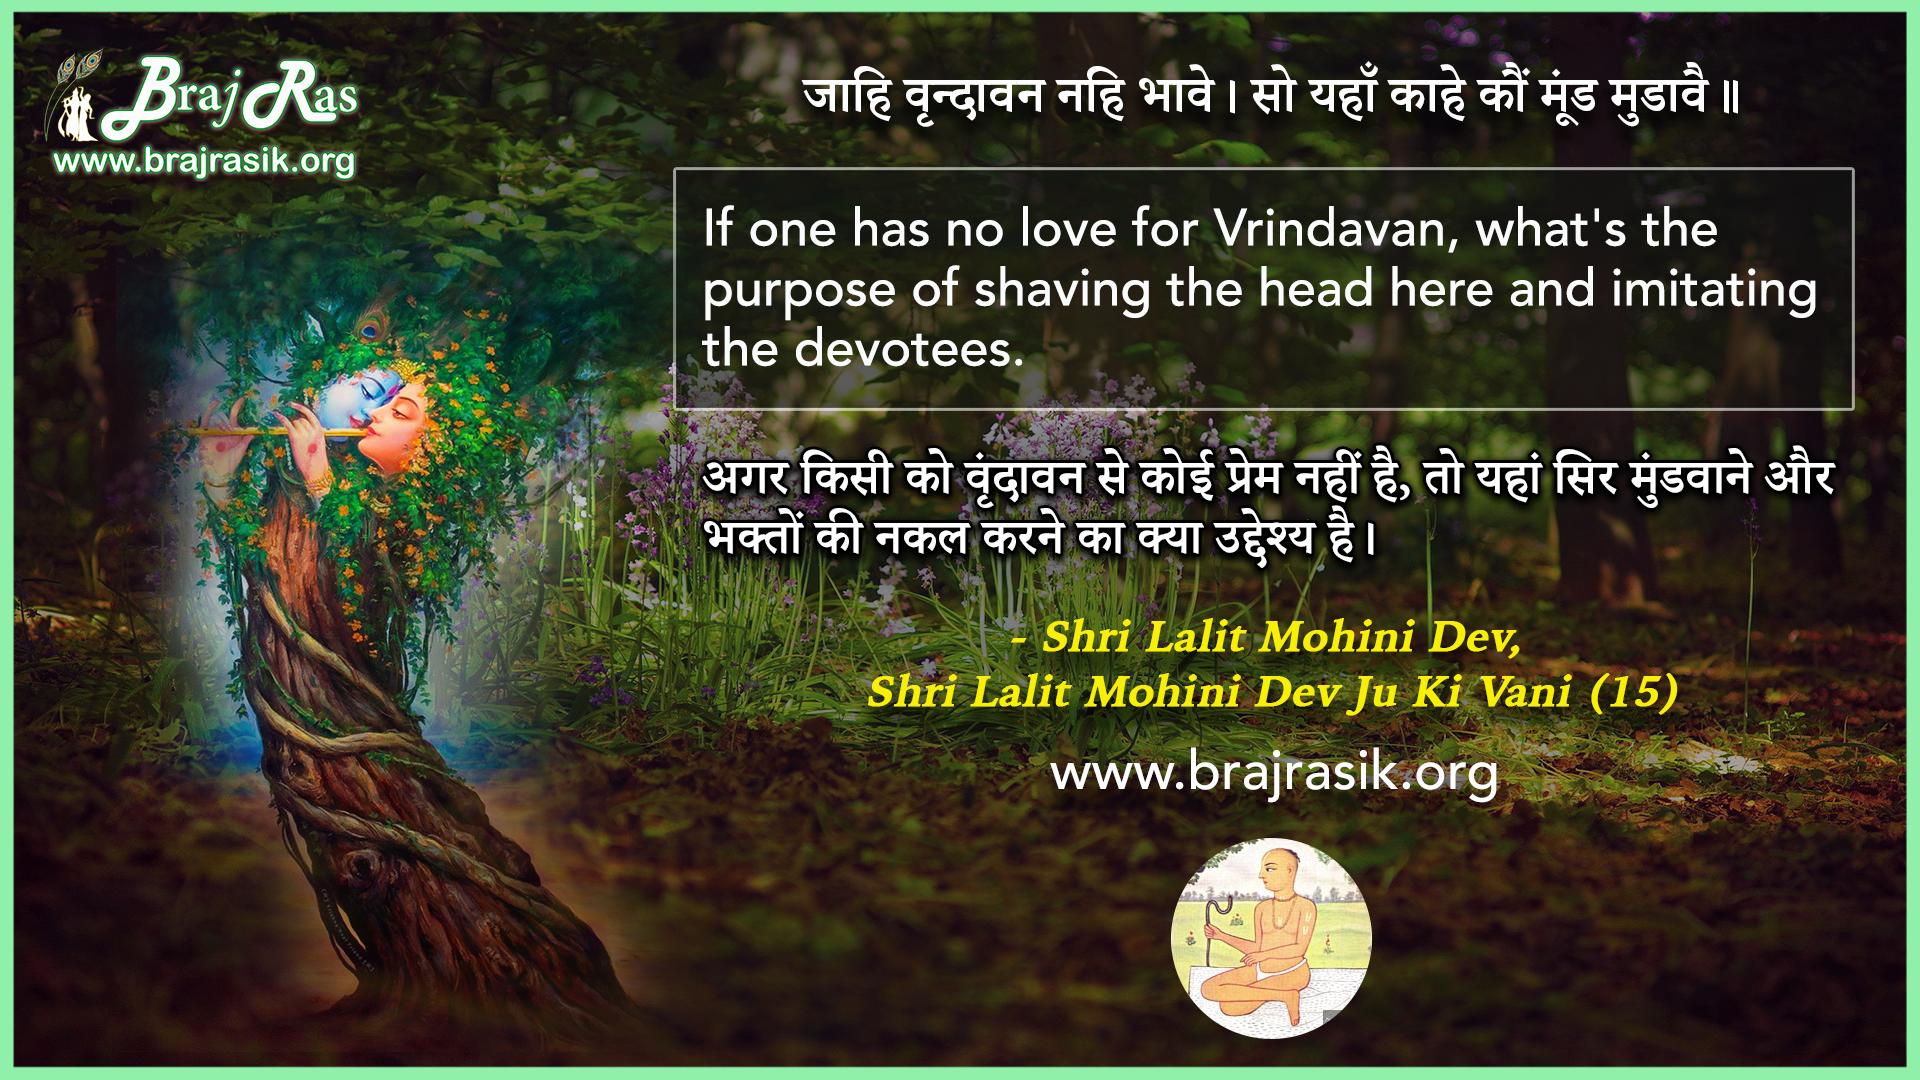 Jaahi Vrindavan Nahi Bhaave - Shri Lalit Mohini Dev, Shri Lalit Mohini Dev Ju Ki Vani (15)